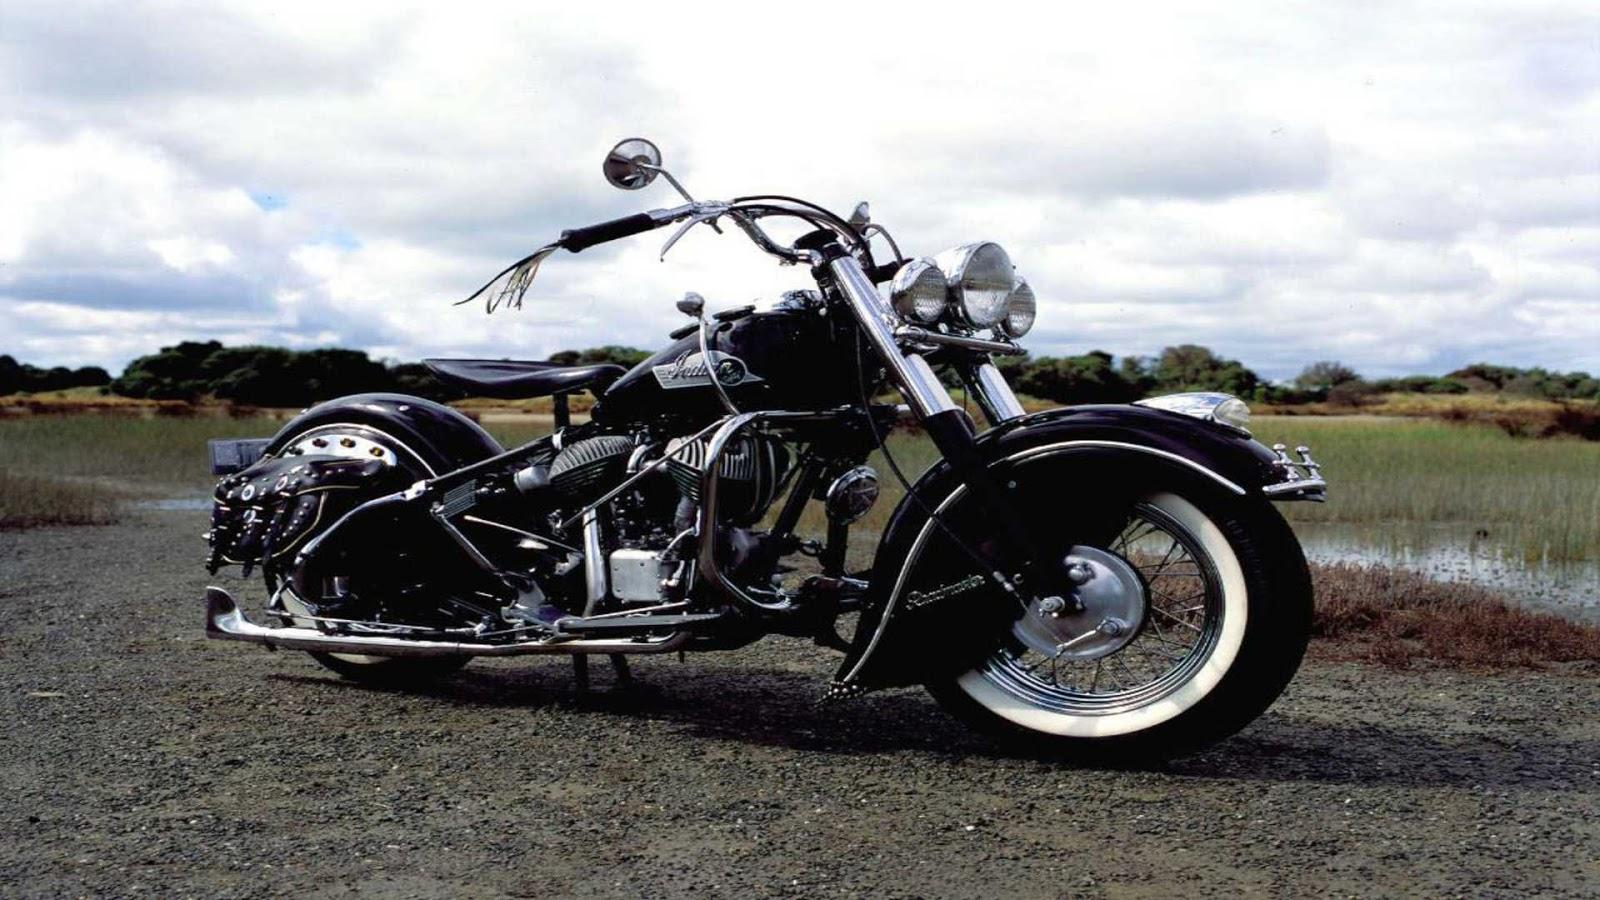 http://3.bp.blogspot.com/-cF1Bo99lYtQ/UNUnUln_LZI/AAAAAAAAit4/VMATPFlLMB4/s1600/Wallpaper+Desktop+moto+-+fondos-motos-indian%5B1%5D-23530.jpeg